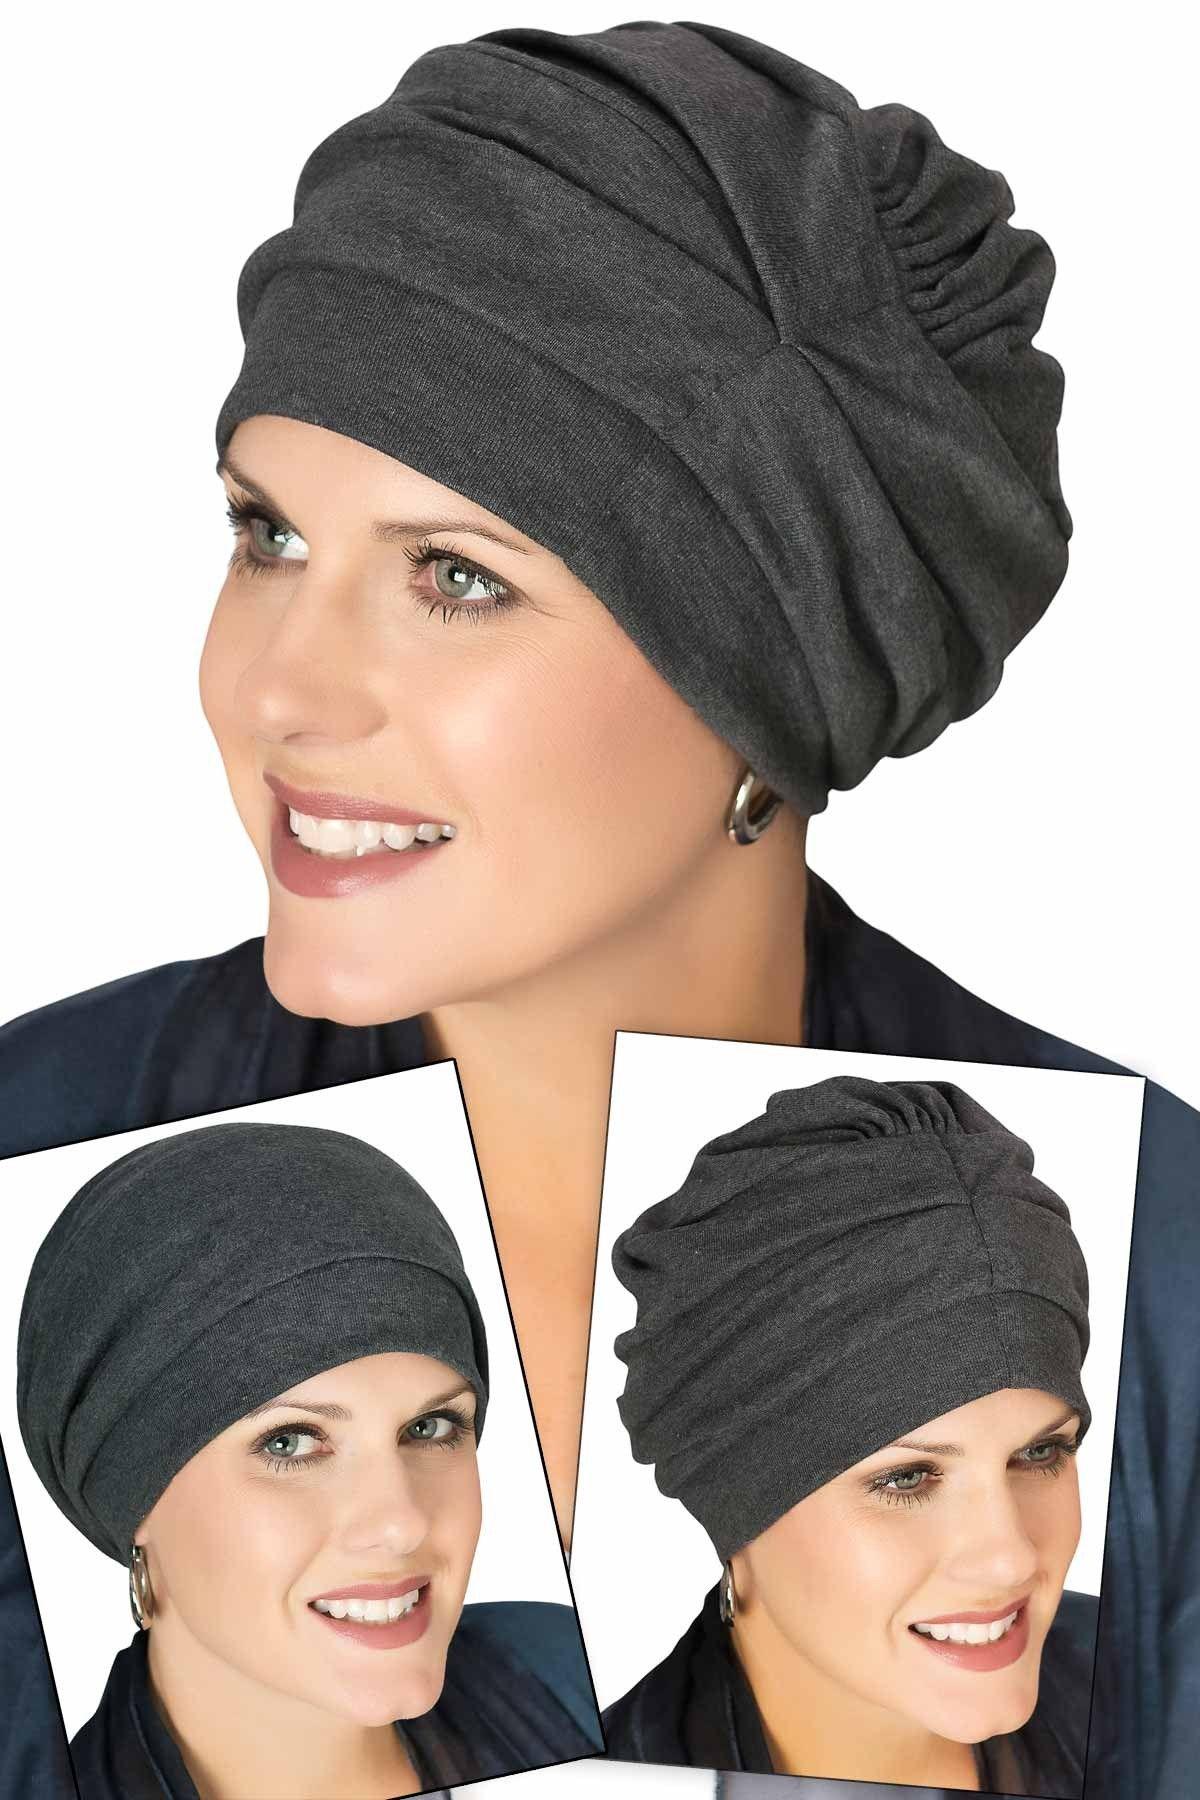 100% Cotton Trinity Turbans - 3 Way Headcovering  ce99bad50b5